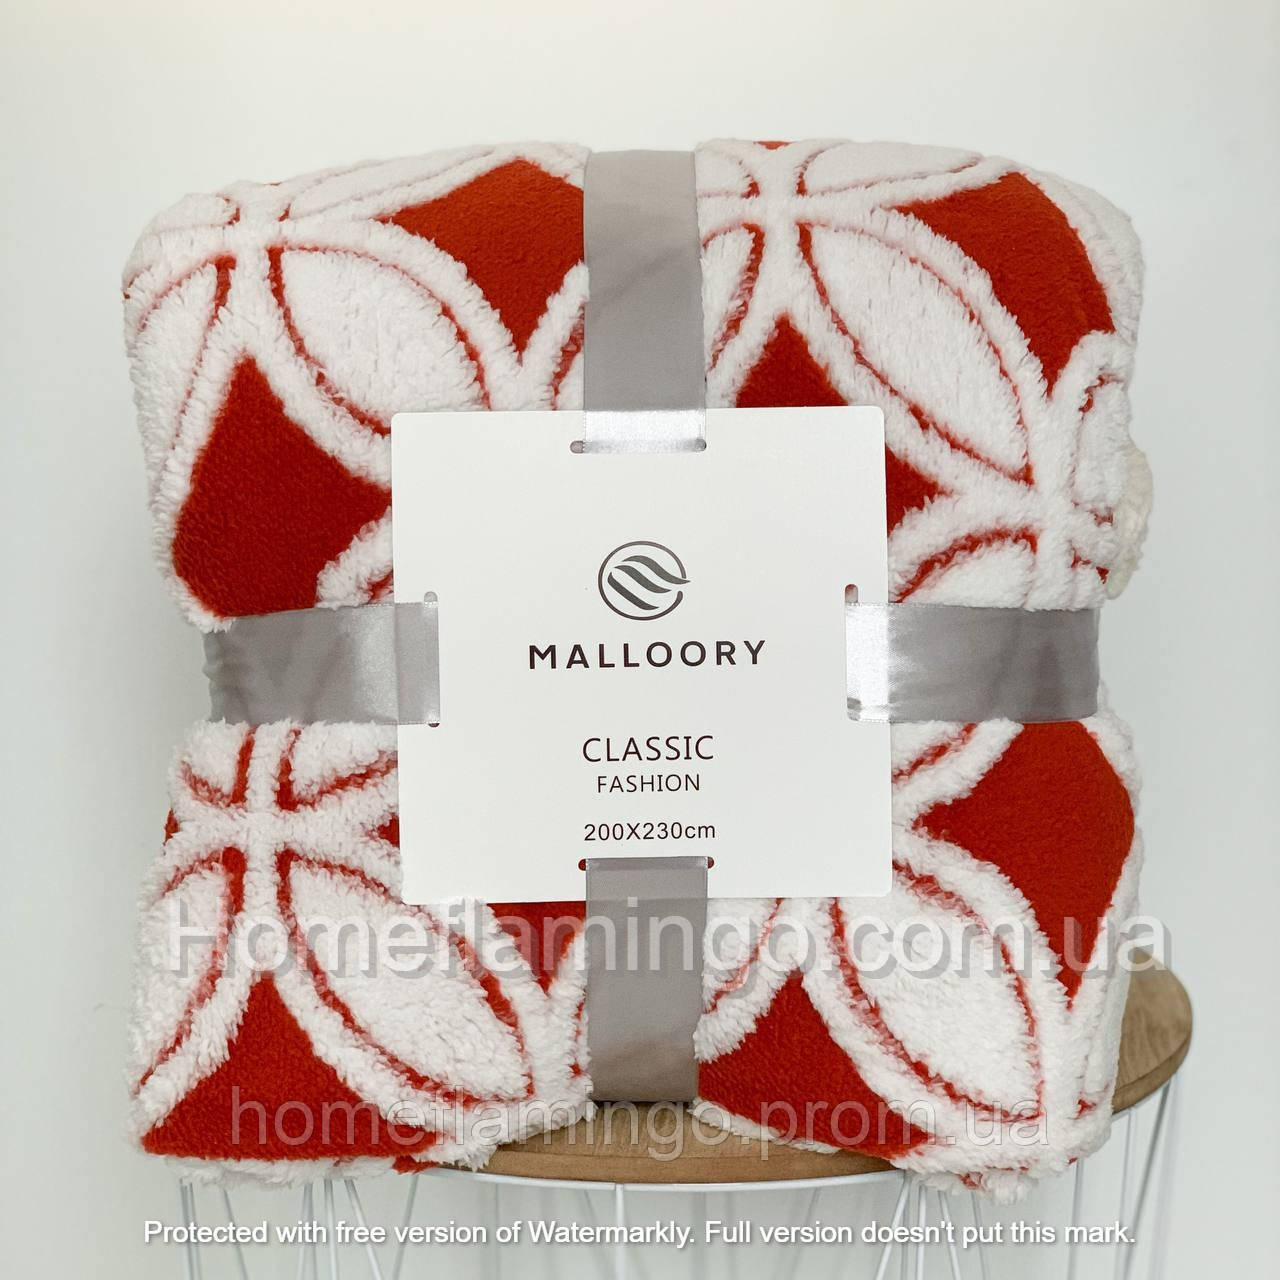 Плед двухсторонний очень теплый с овчины и красивым узором, цвет красно-белый Red Malloory 200х230 см